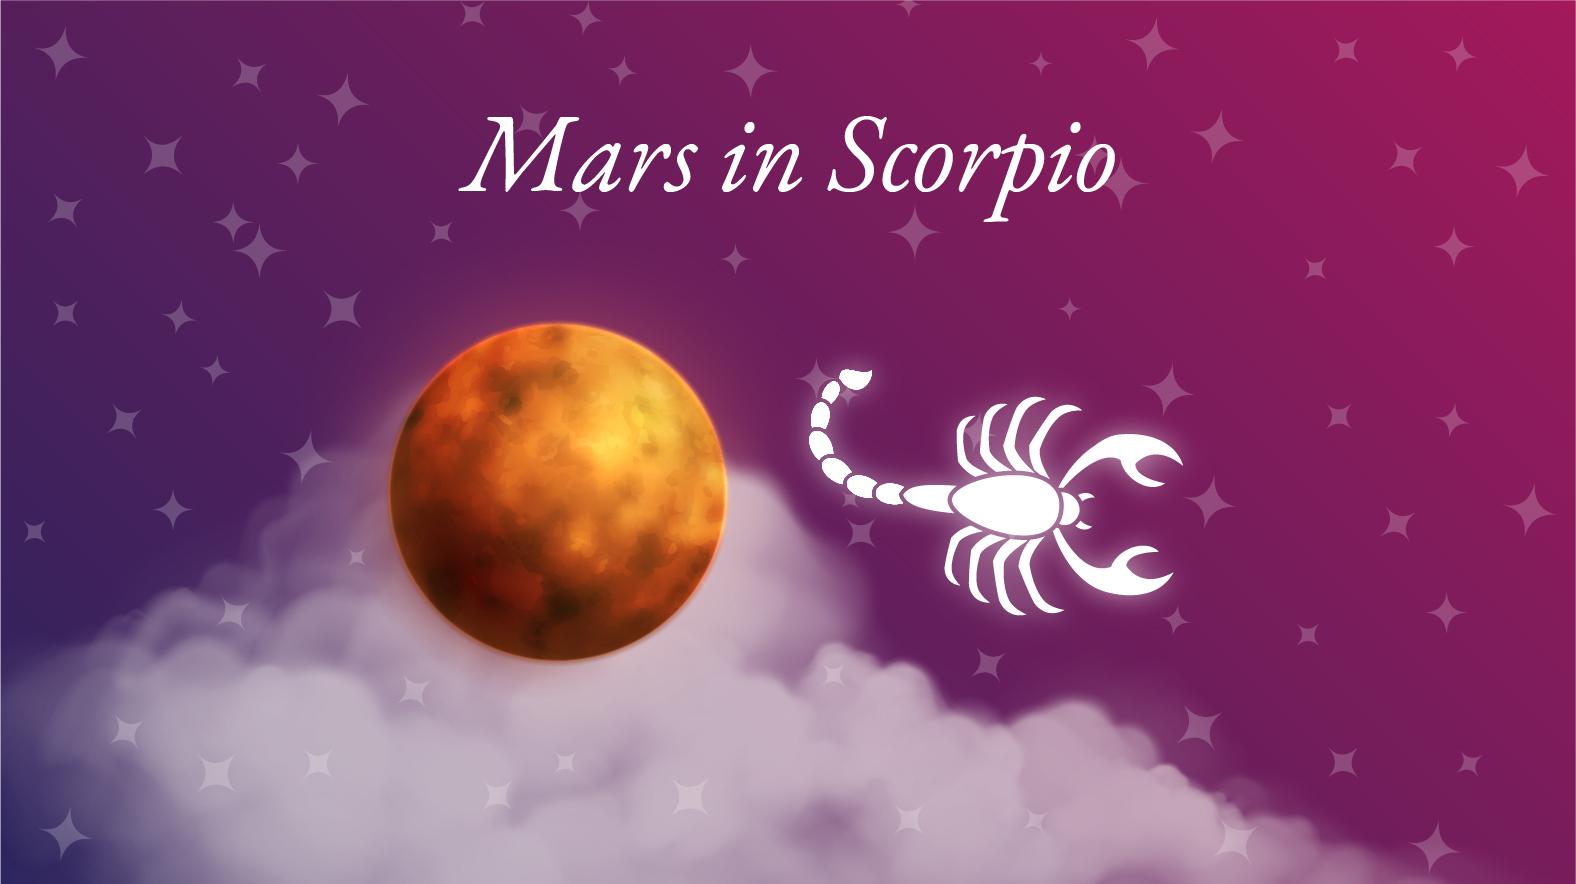 Mars in Scorpio Meaning